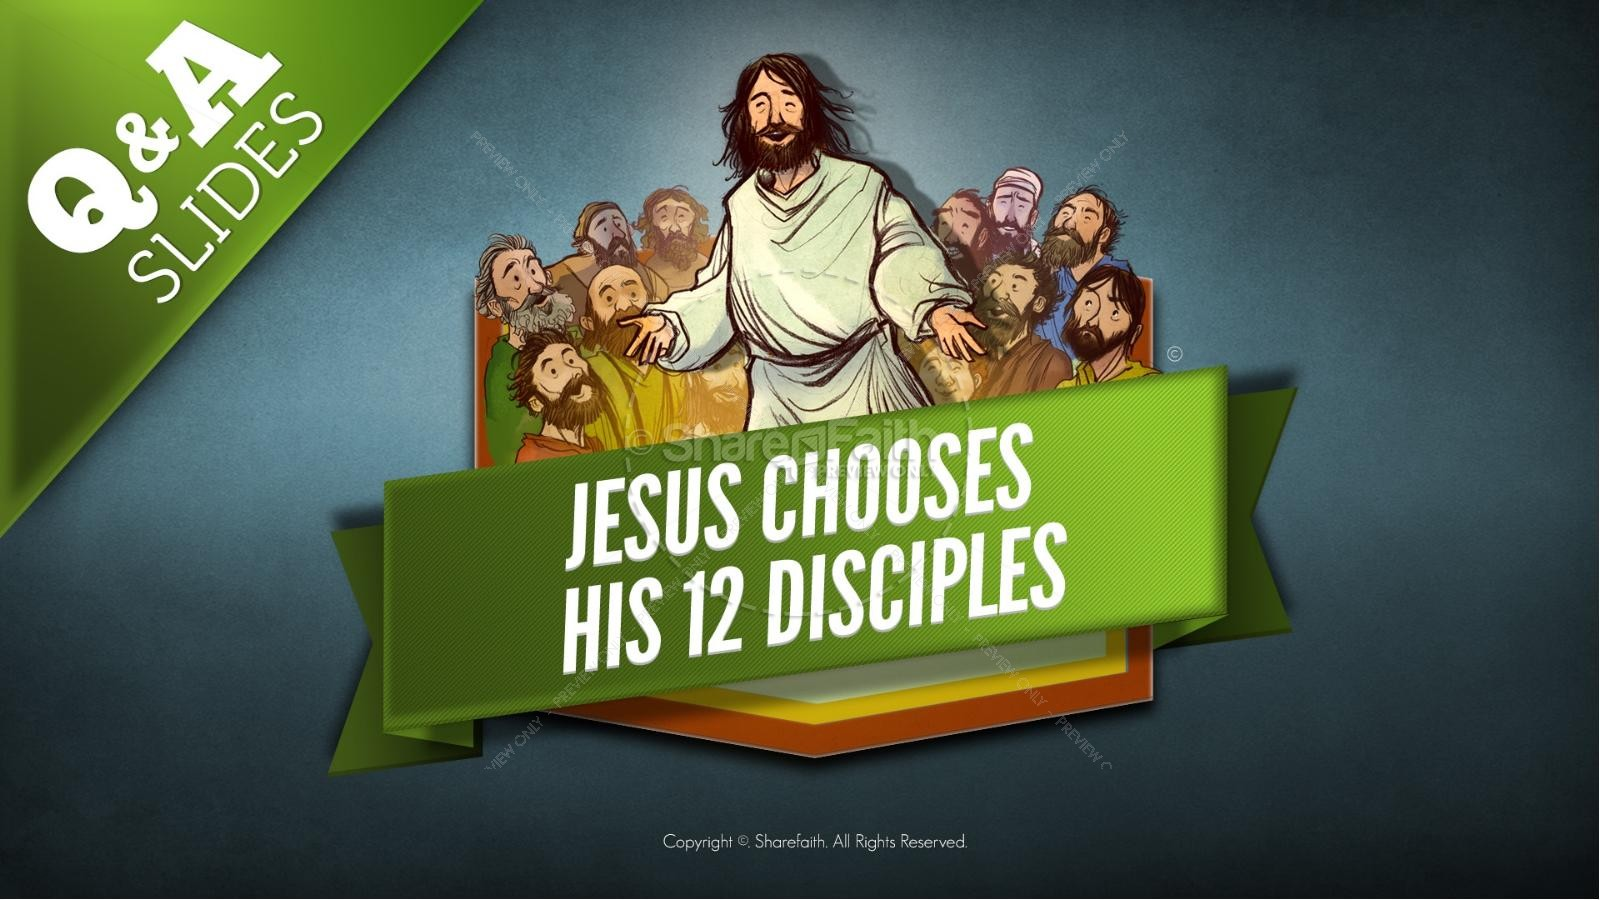 Jesus Chooses His 12 Disciples Kids Bible Story